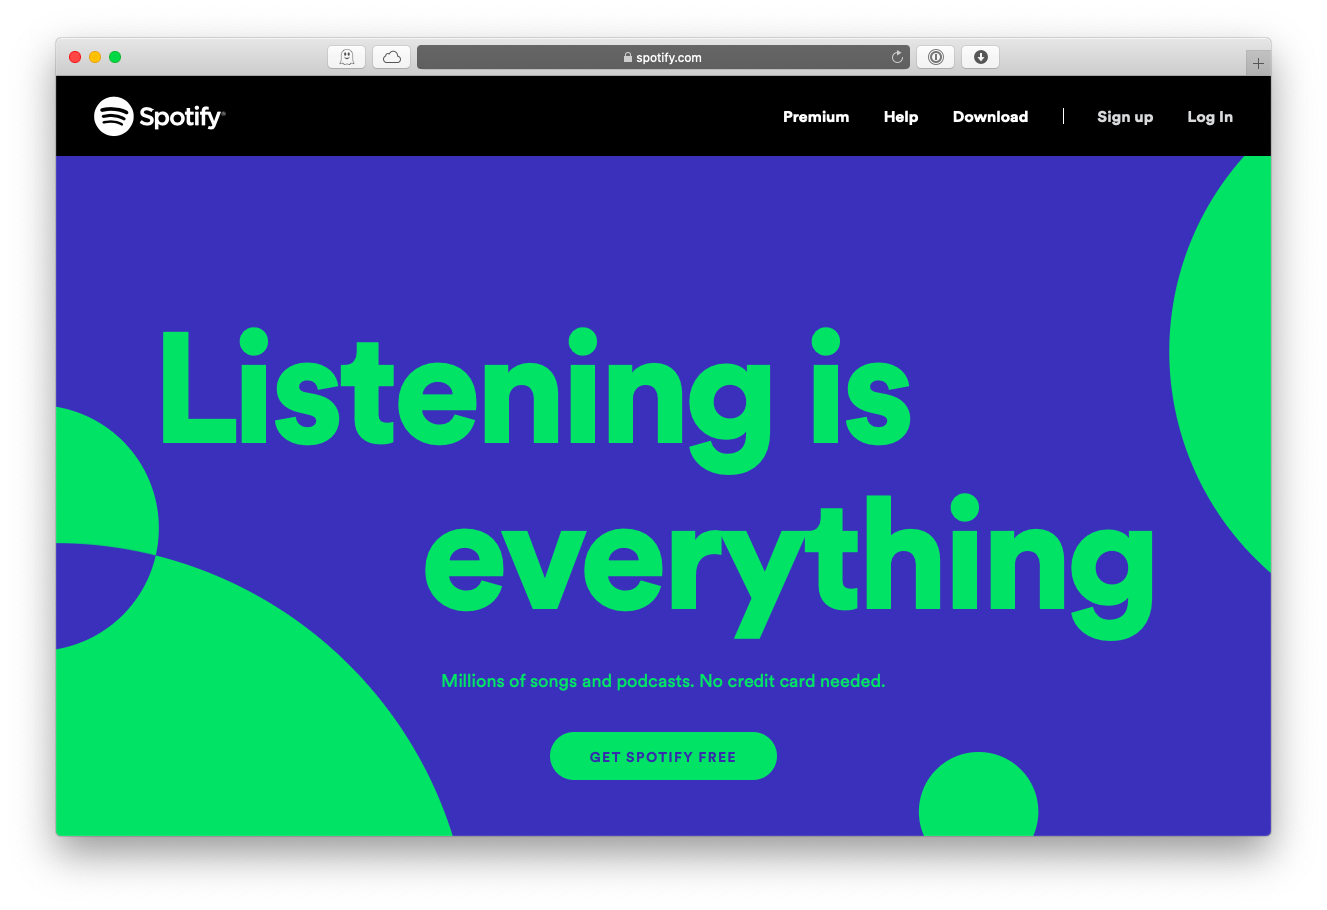 Spotify web music streaming service